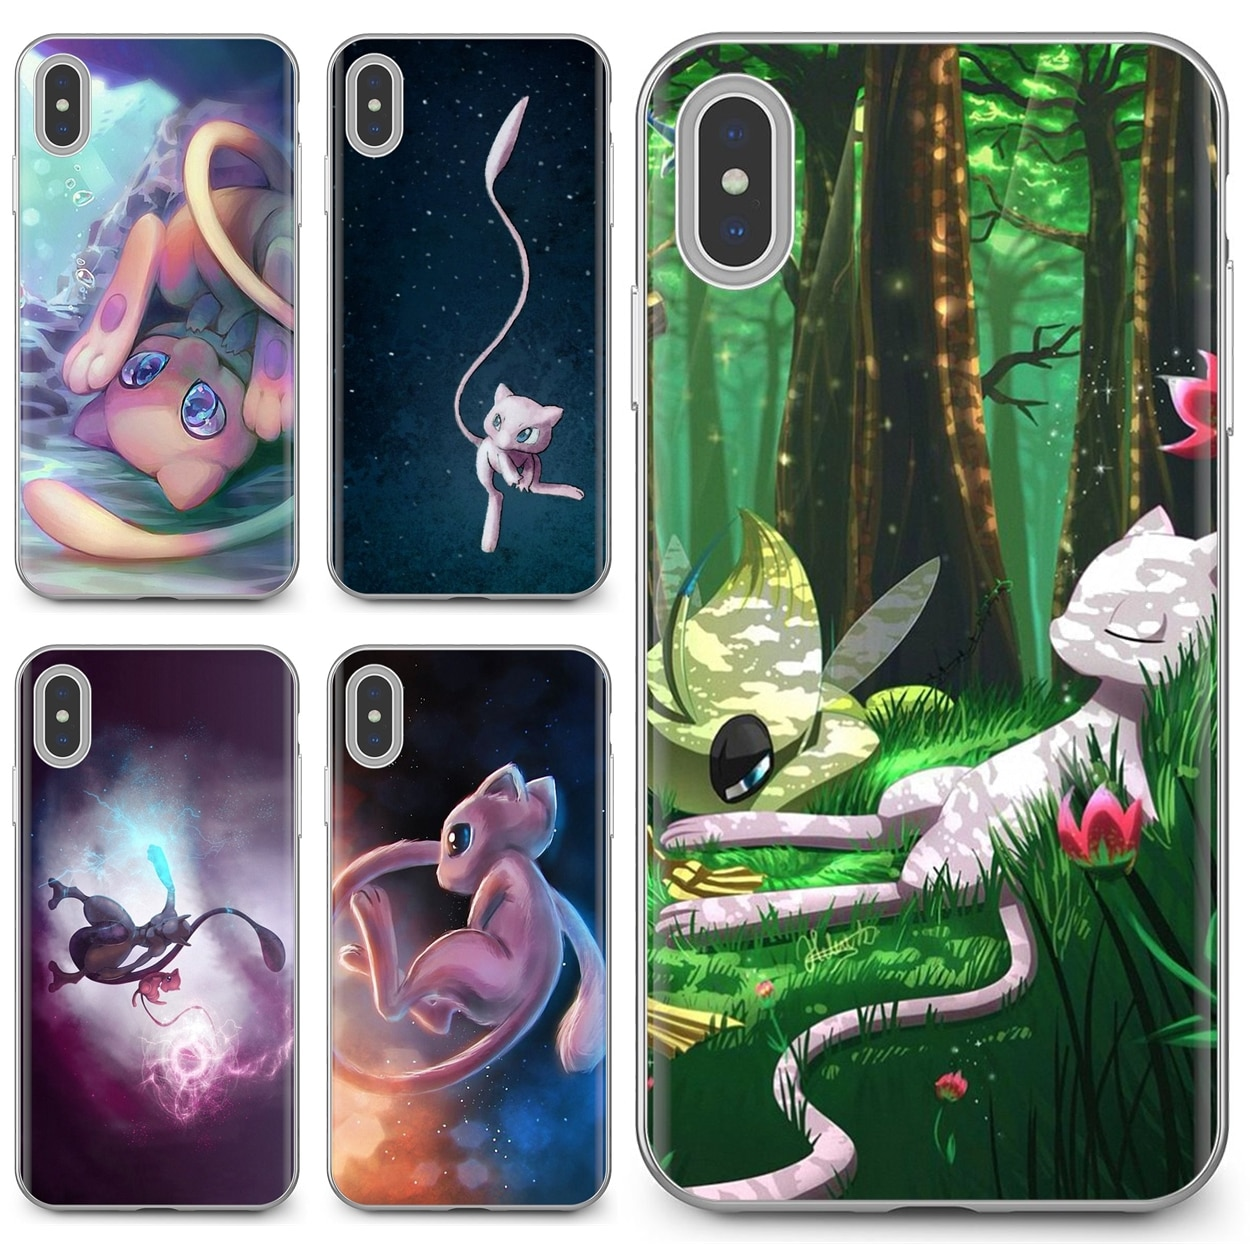 Para iPhone 11 Pro 4 4S 5 5S SE 5C 6 6S 7 8X10 XR XS Plus para iPod Touch pintura mew Games mewtwo funda de silicona para teléfono